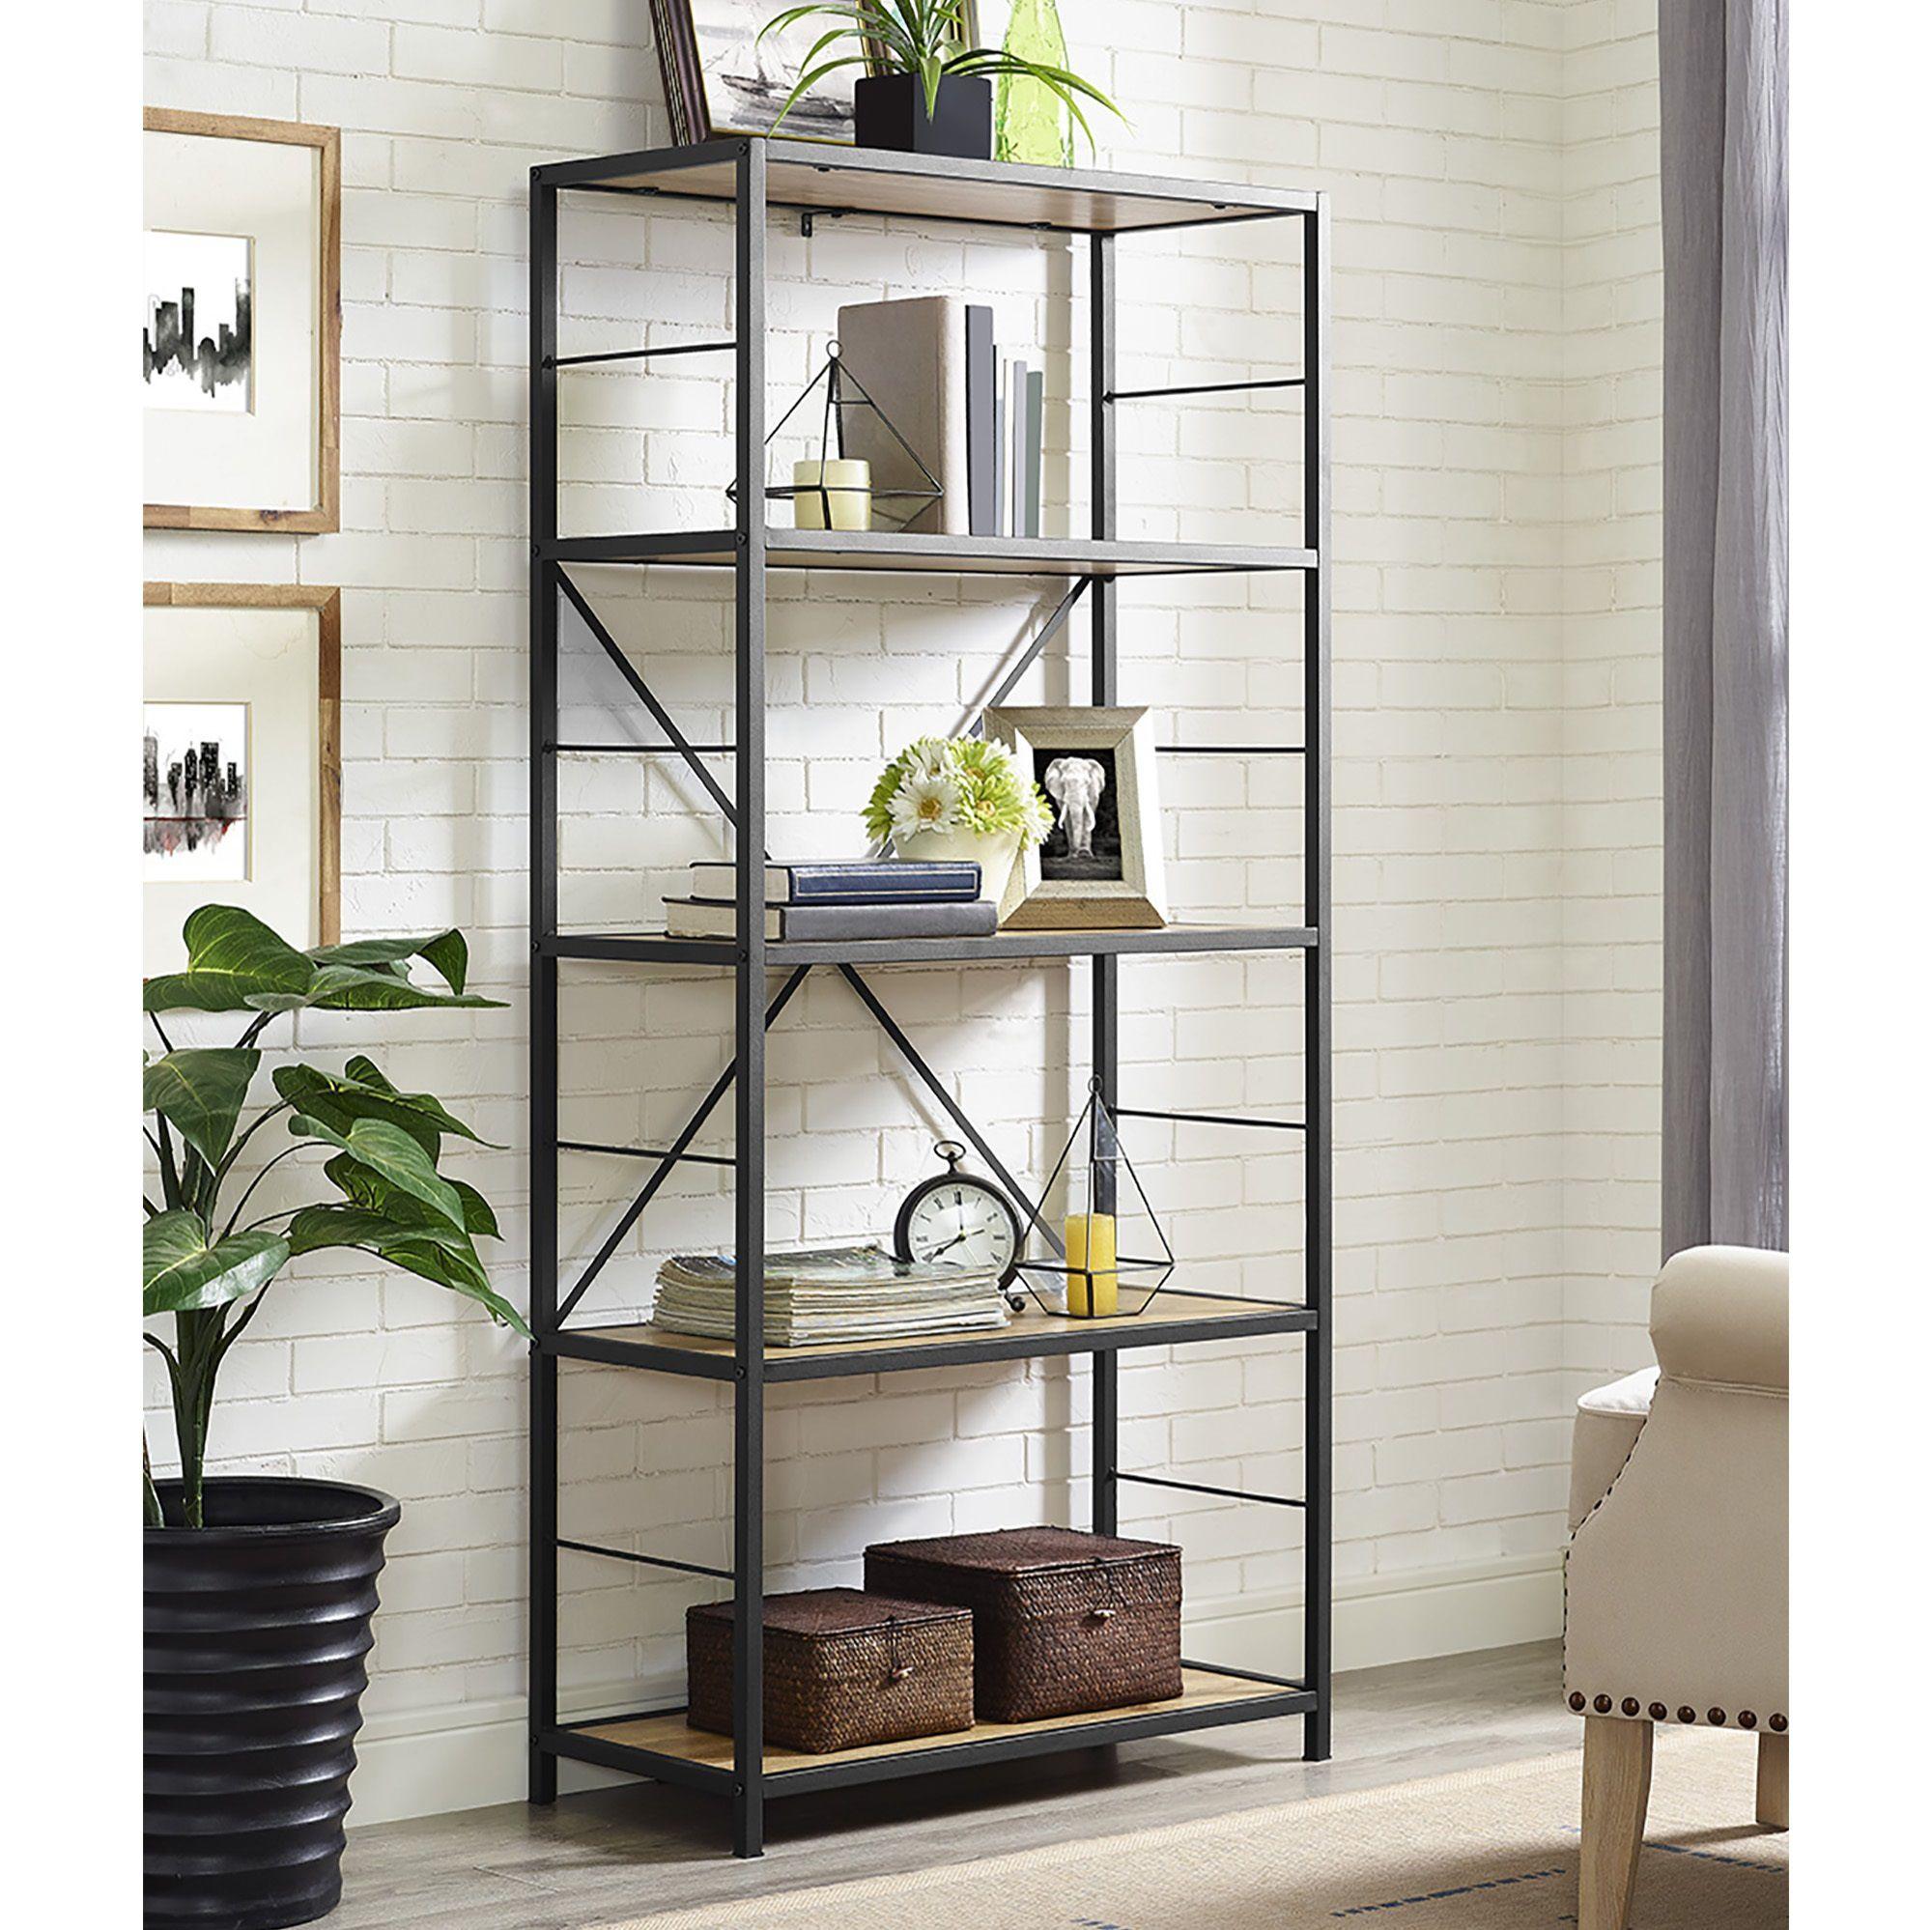 W Trends 60 5 Shelf Rustic Metal And Wood Media Bookshelf Barnwood